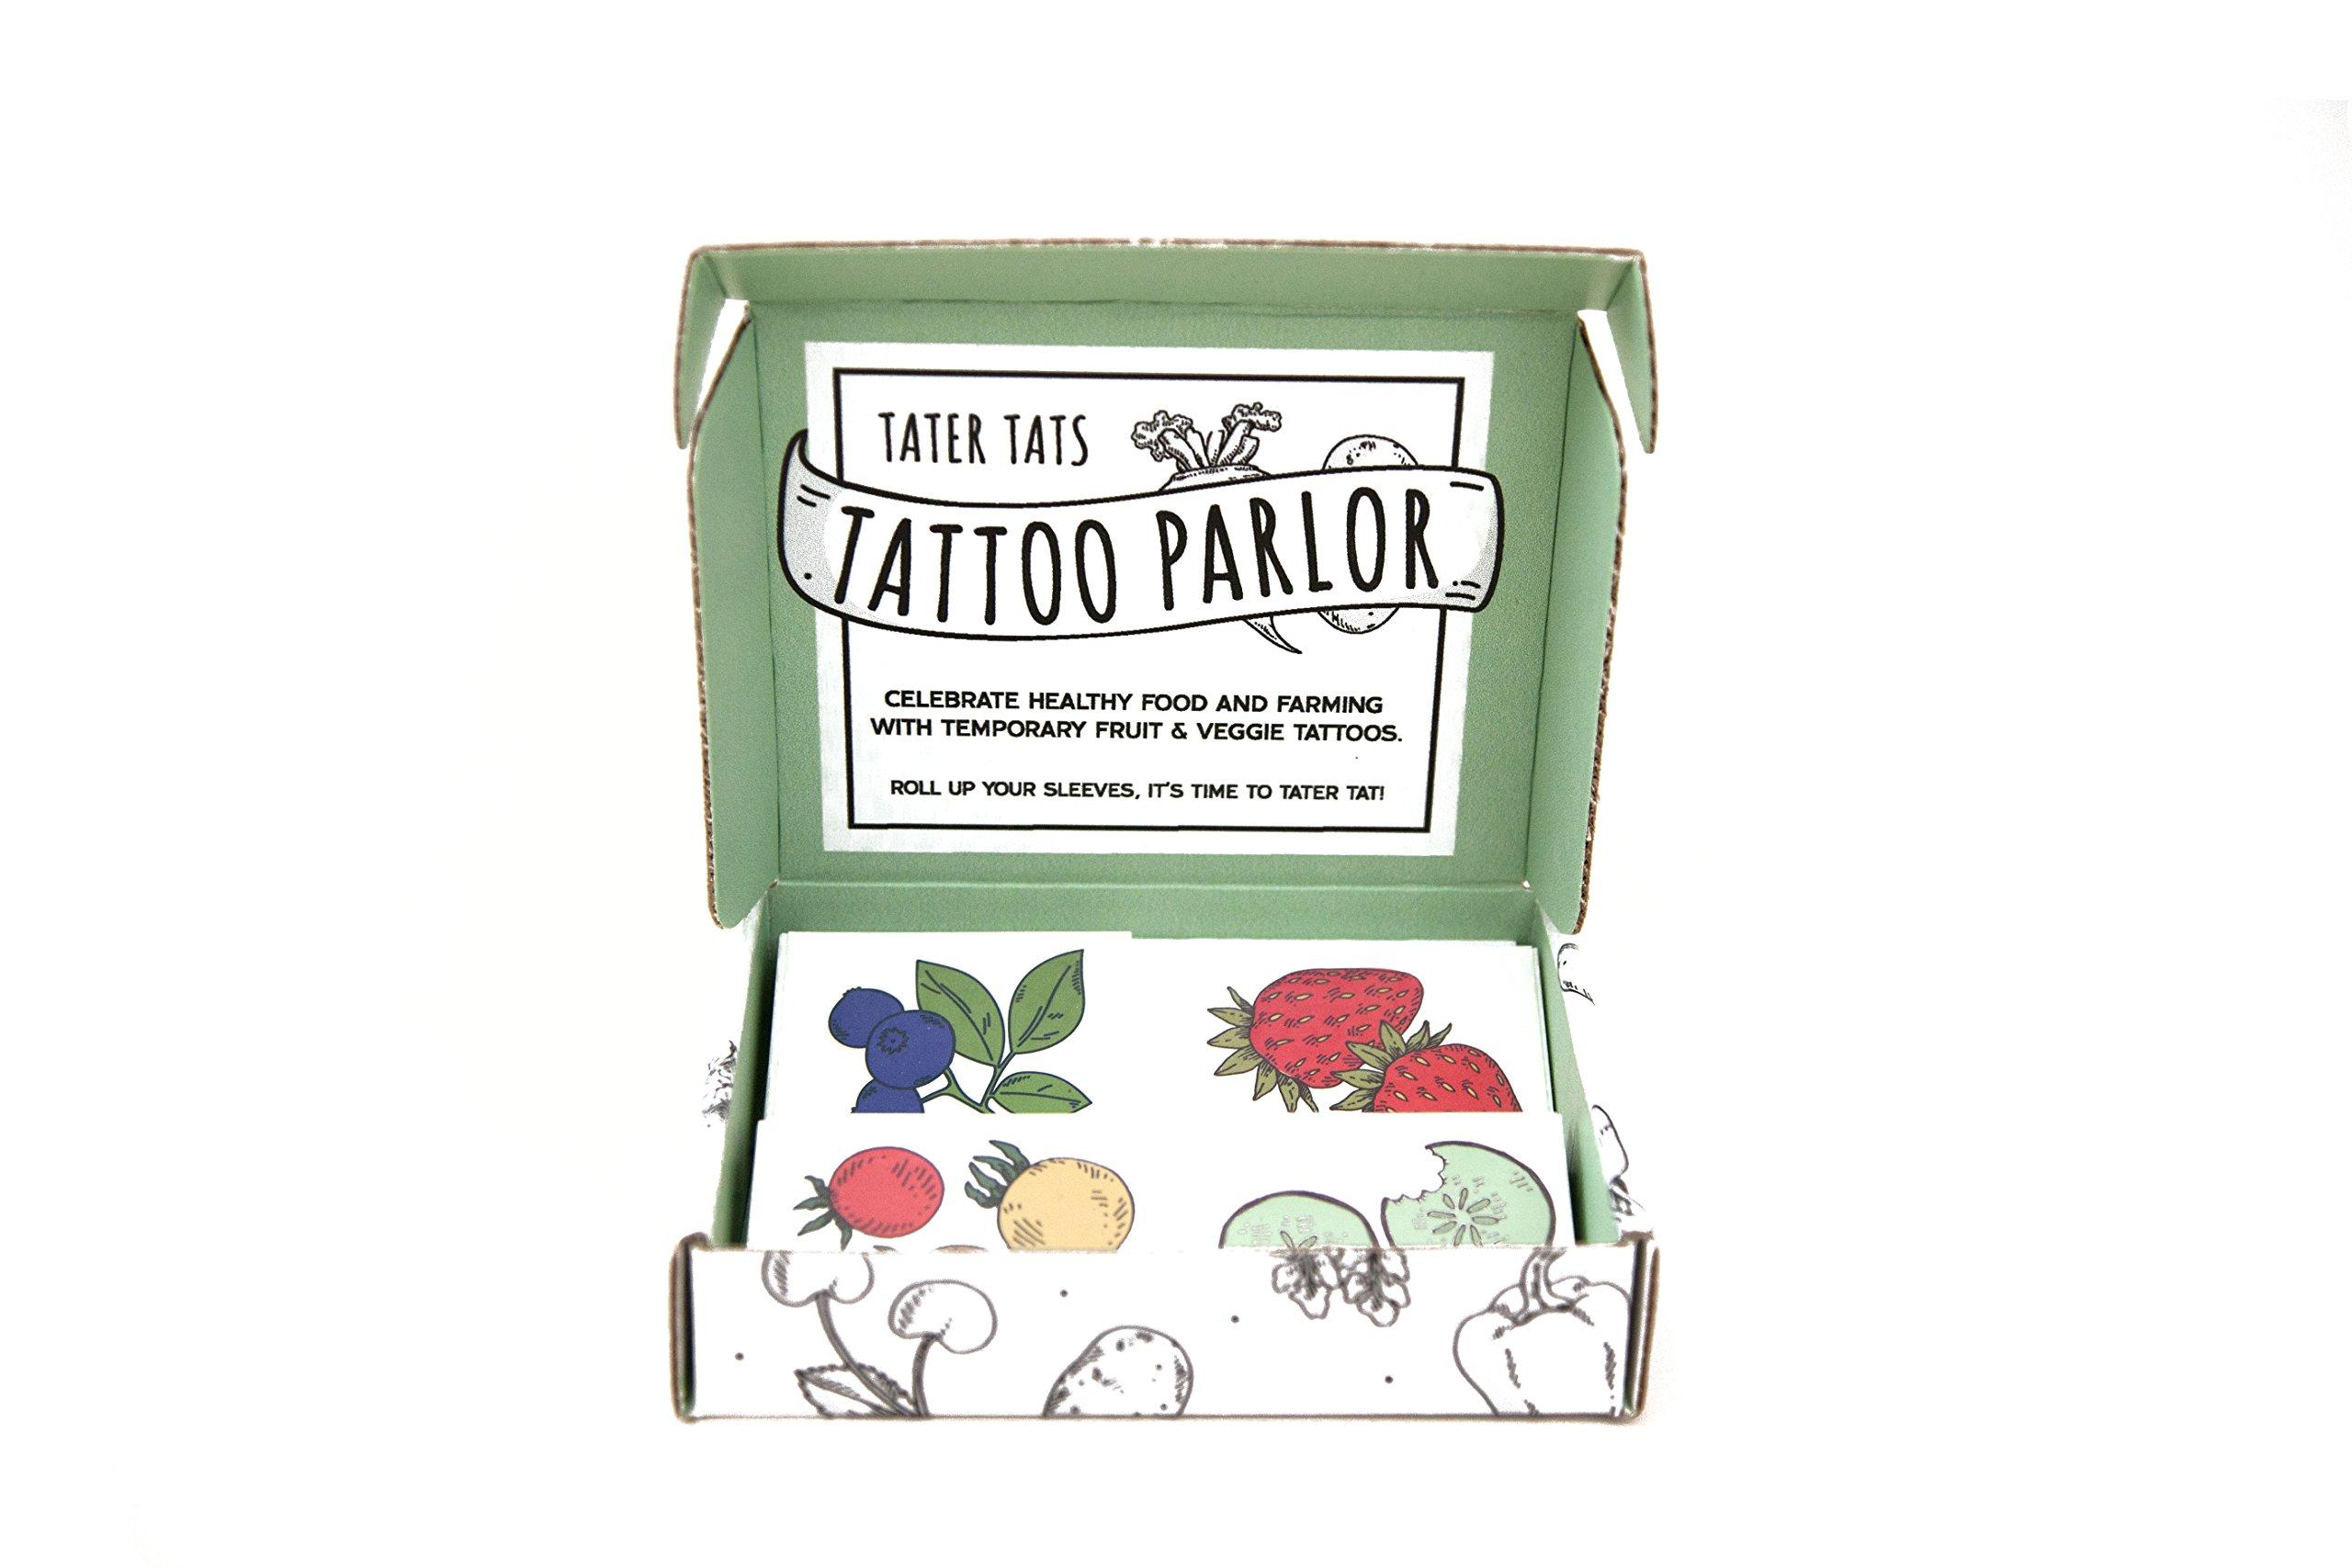 Tater Tats Pop-Up Tattoo Parlor: 100 Temporary Vegetable Tattoos